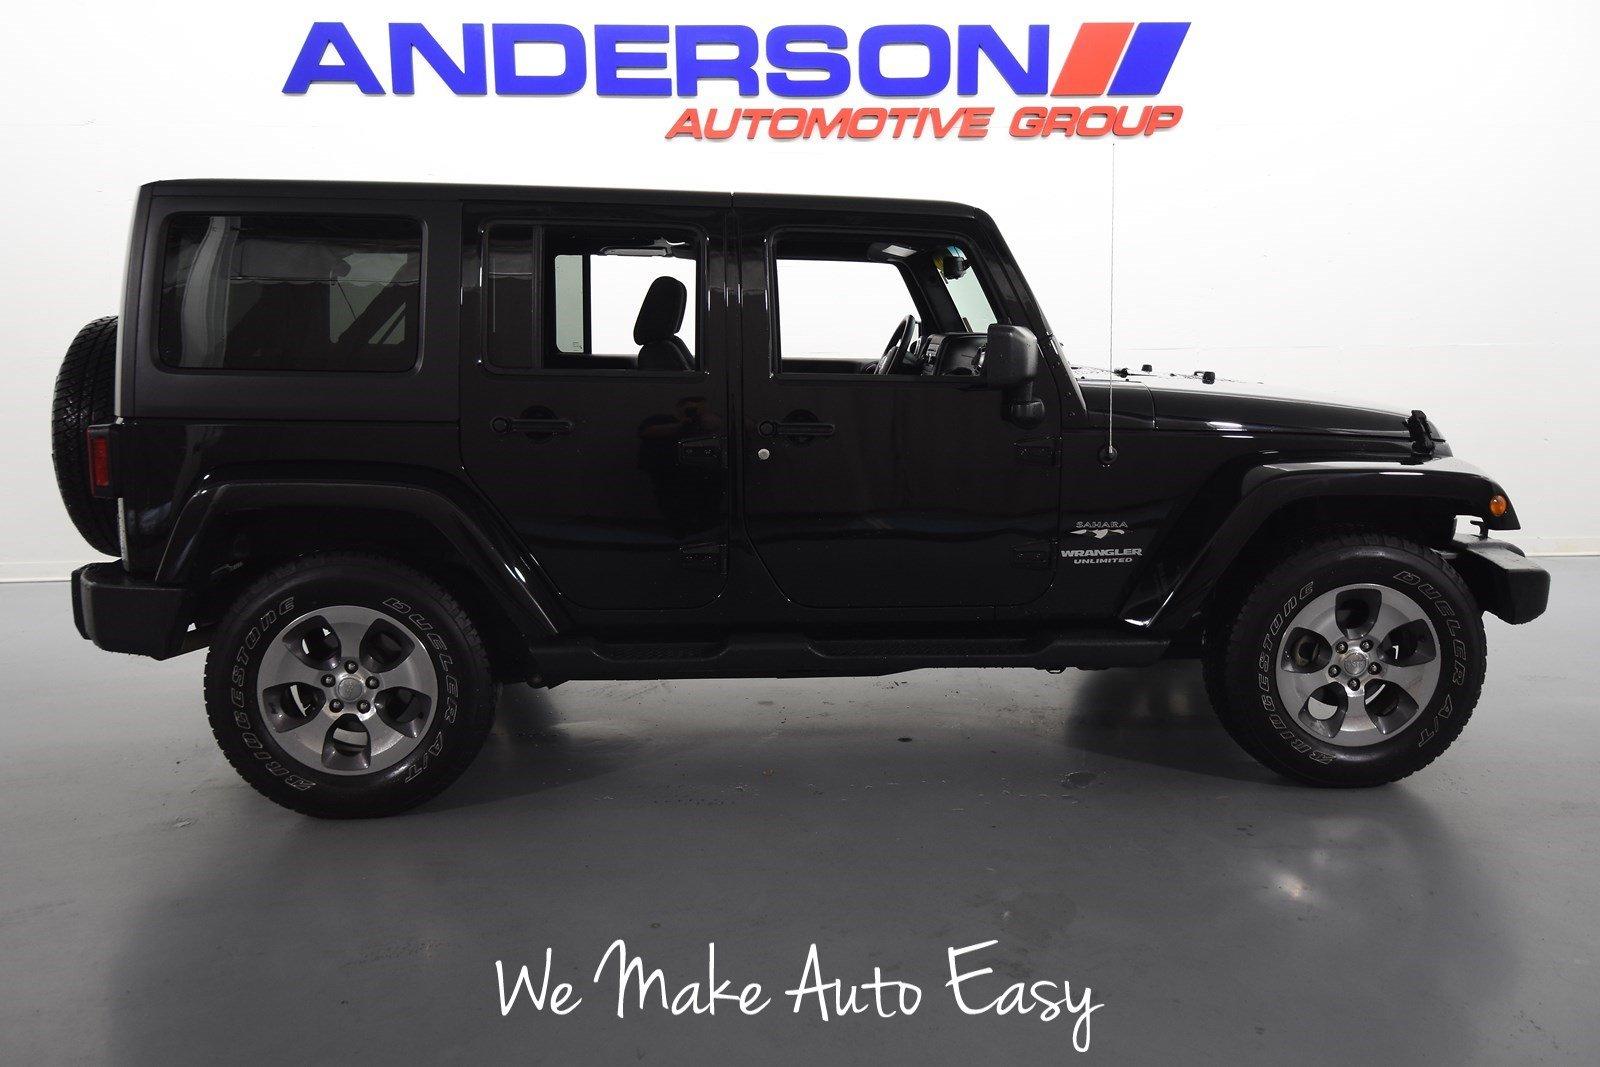 2016 Jeep Wrangler JK Unlimited Sahara 4x4 SUV